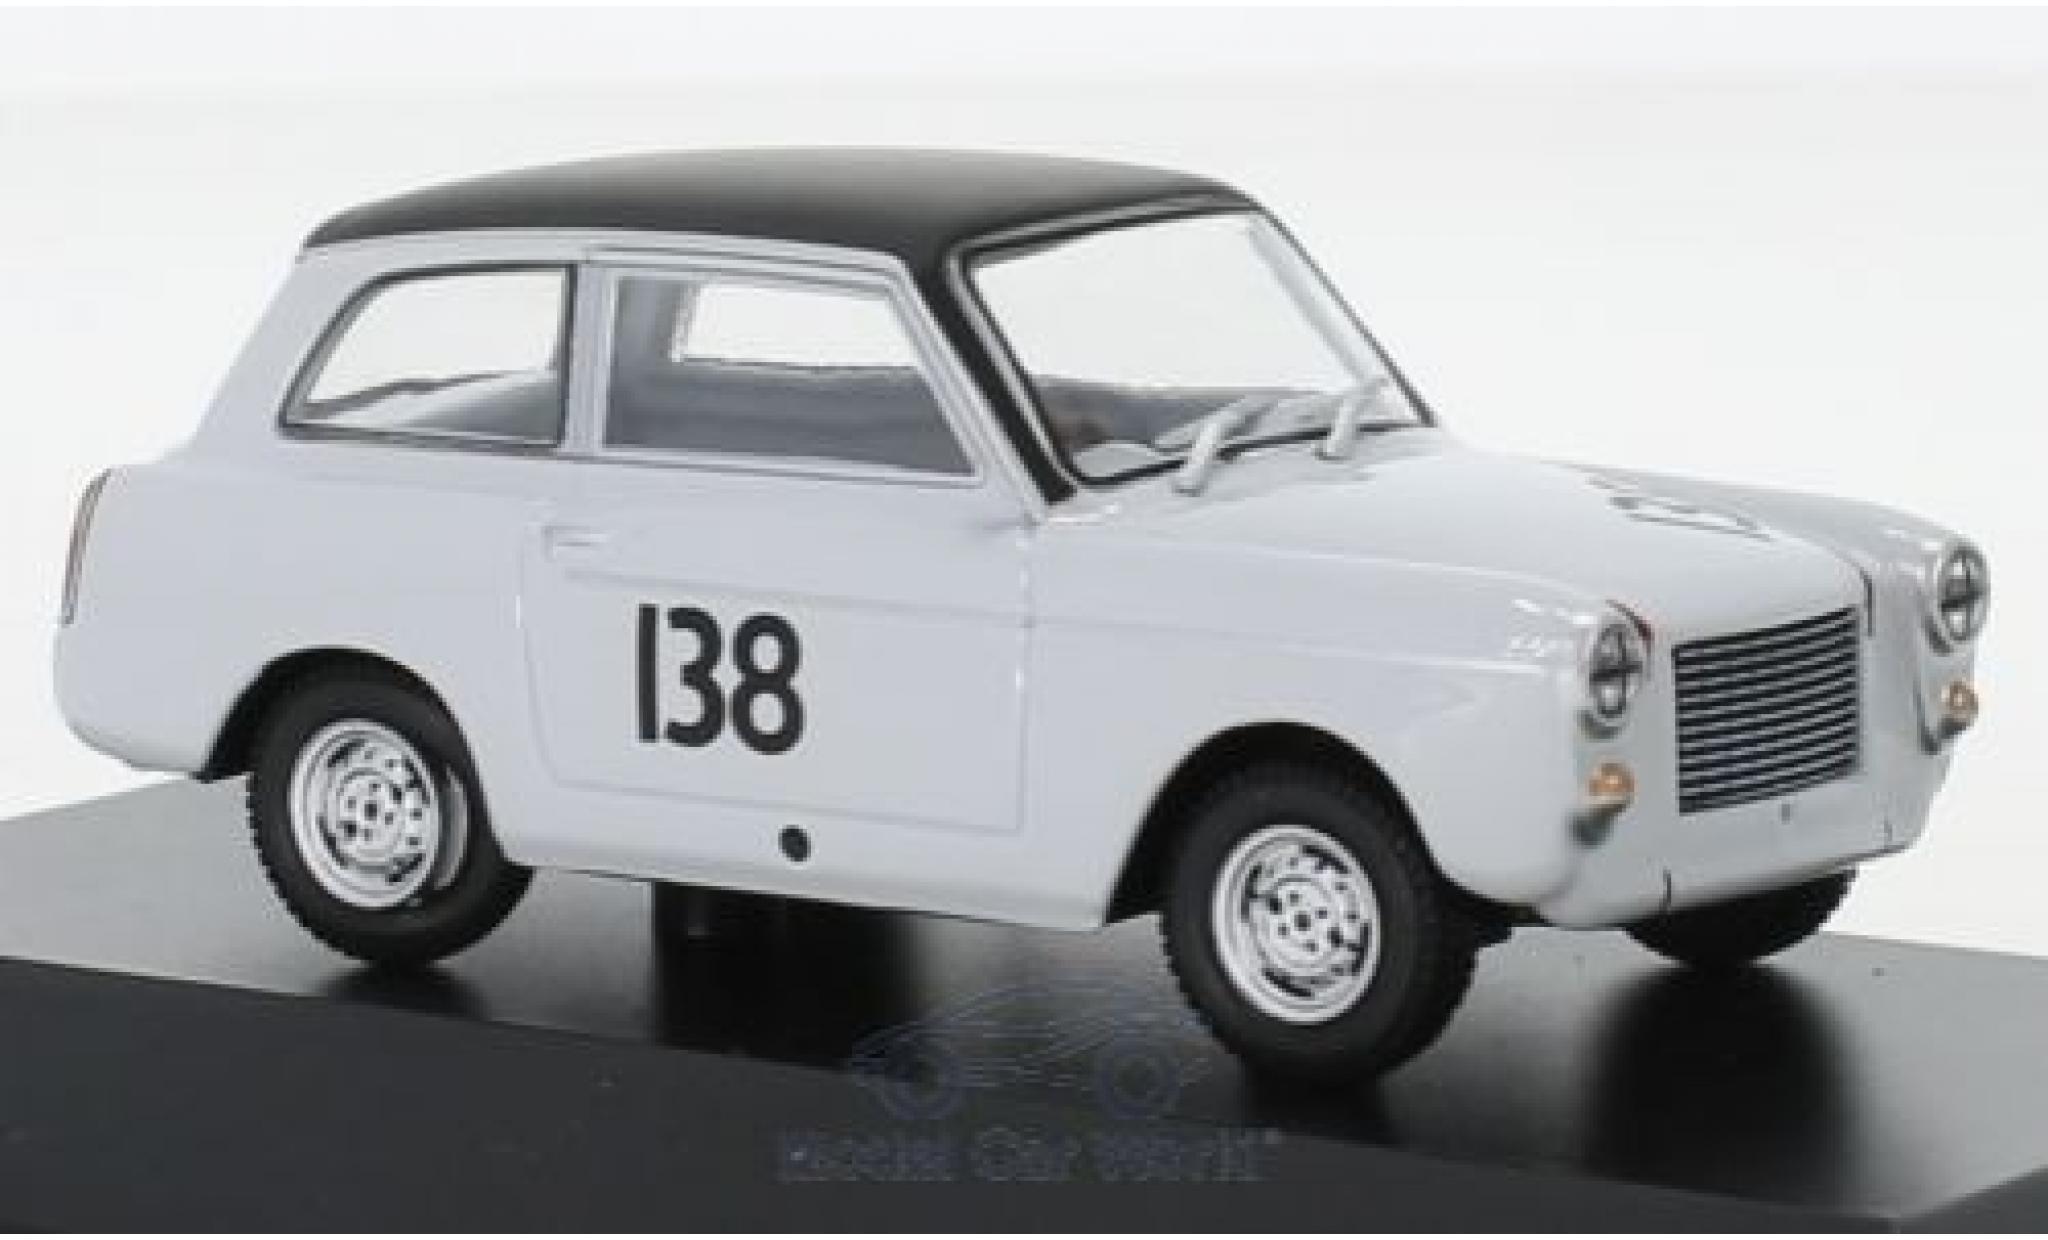 Austin A40 1/43 SpecialC 92 RHD No.138 Don Moore Racing BTCC 1960 G.Shepherd